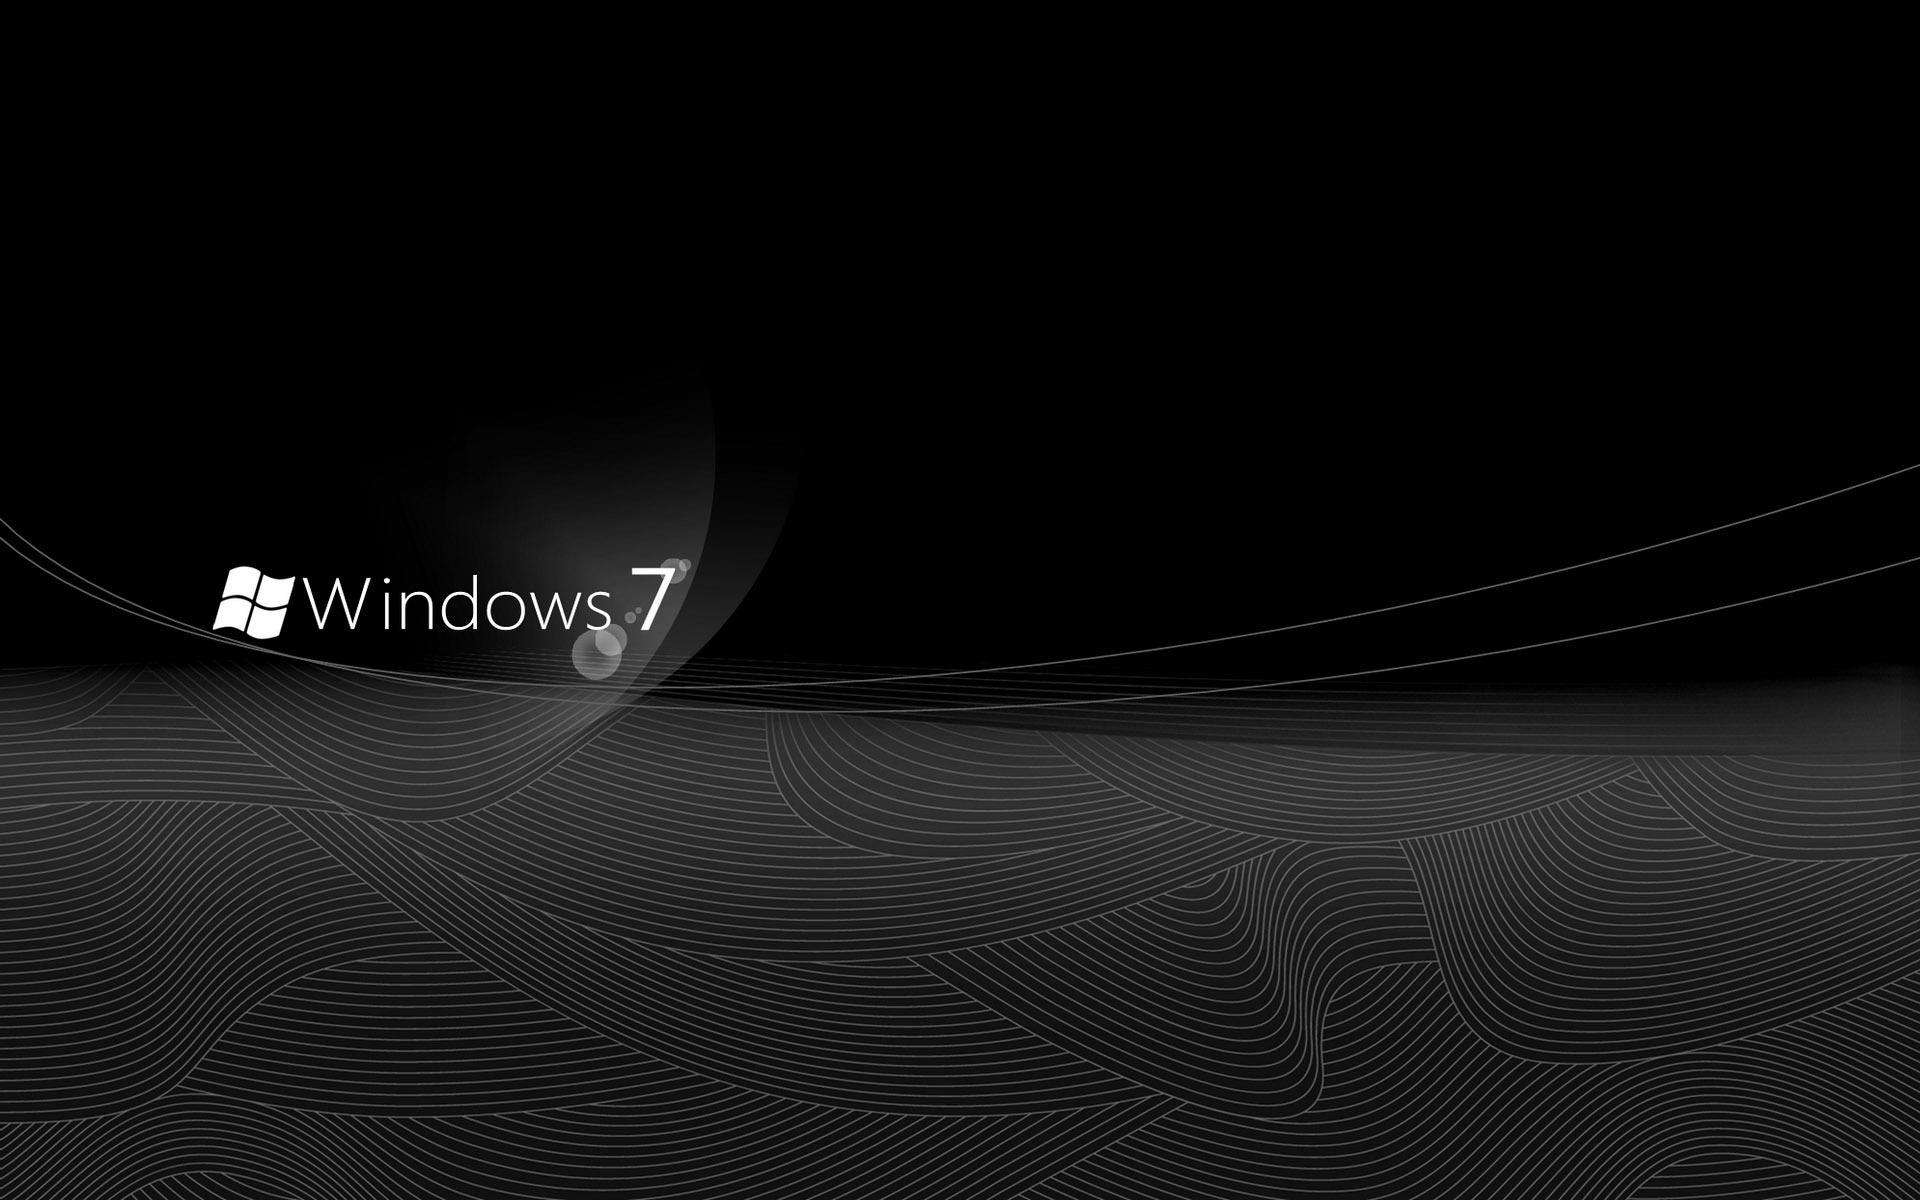 Black Windows 7 Exclusive HD Wallpapers 330 1920x1200